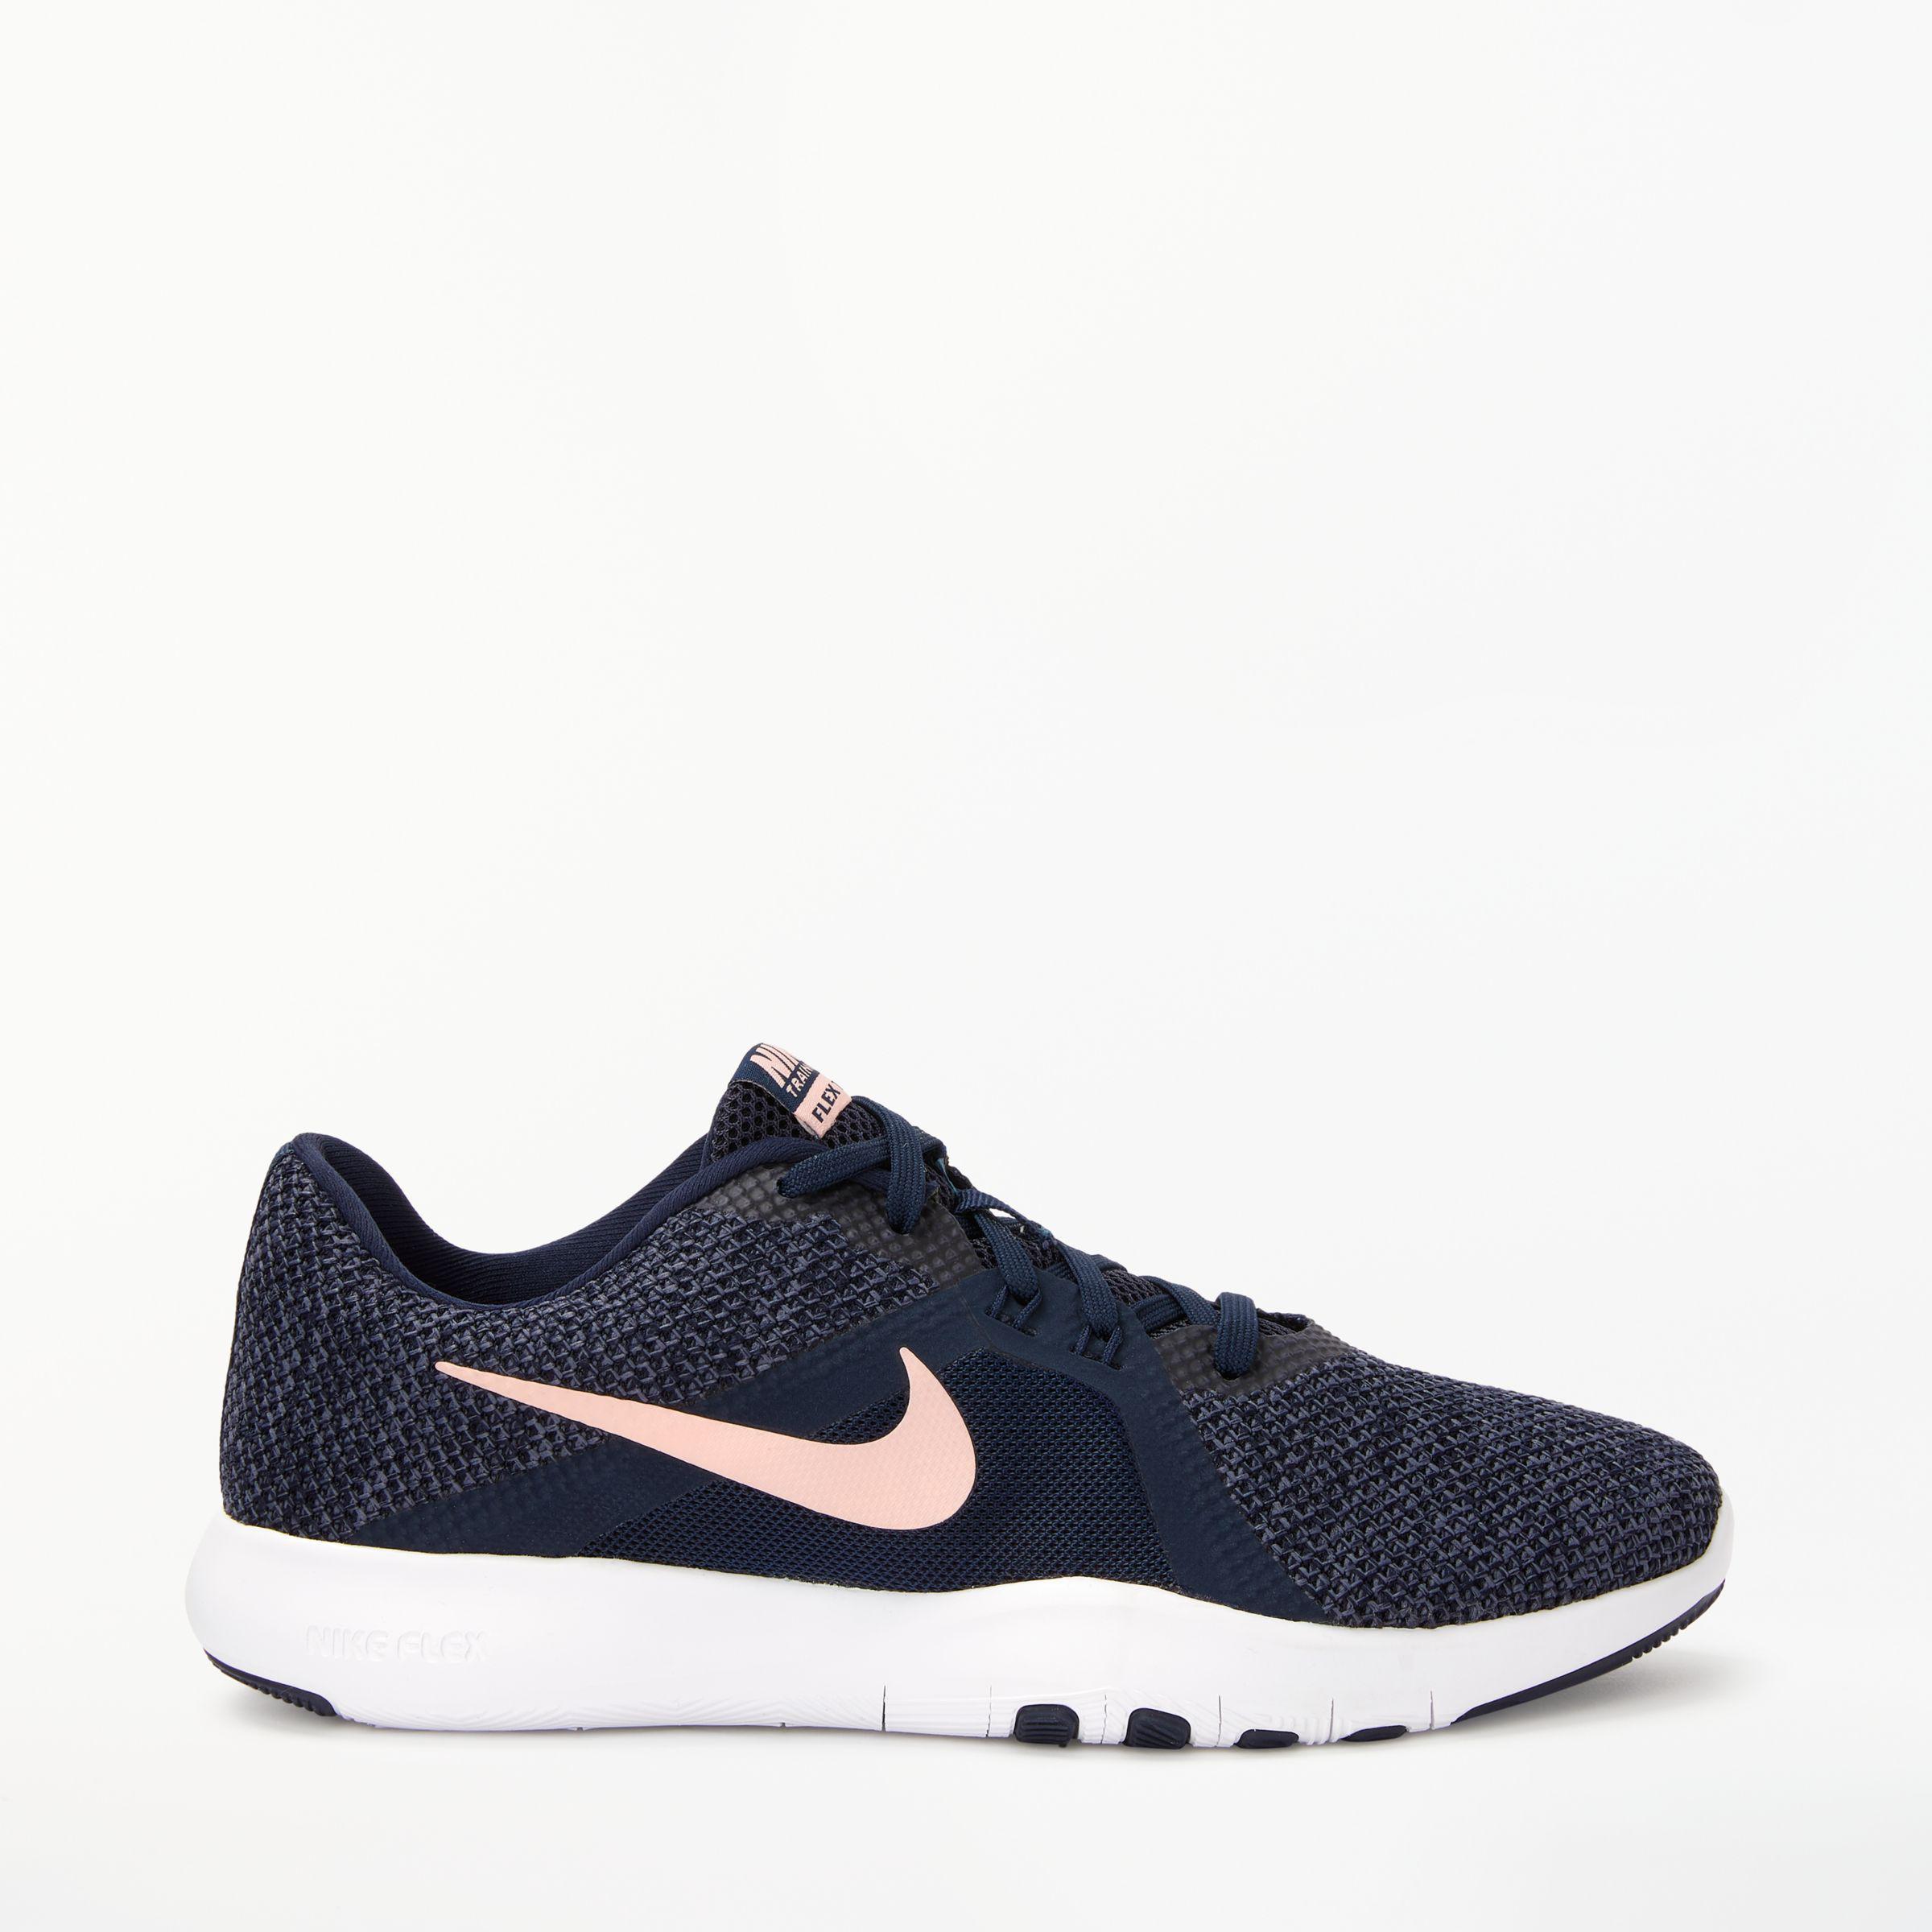 ecc4586f0853 Nike Flex Tr 8 Women s Training Shoes in Blue - Lyst